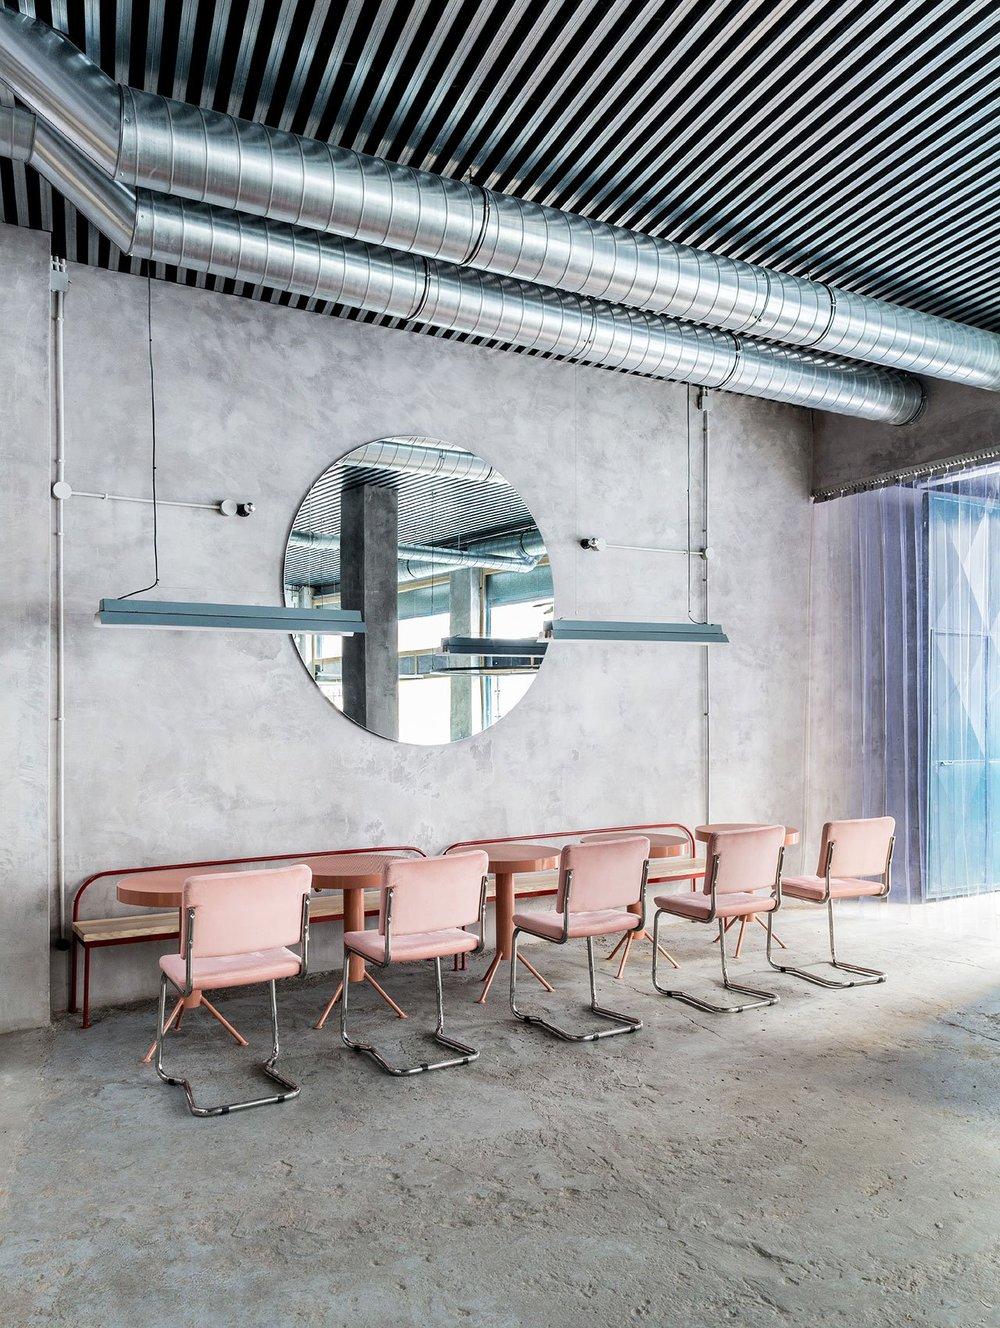 f6_casaplata_seville_spain_lucas_y_hernandez_gil_architects_dezainaa_5